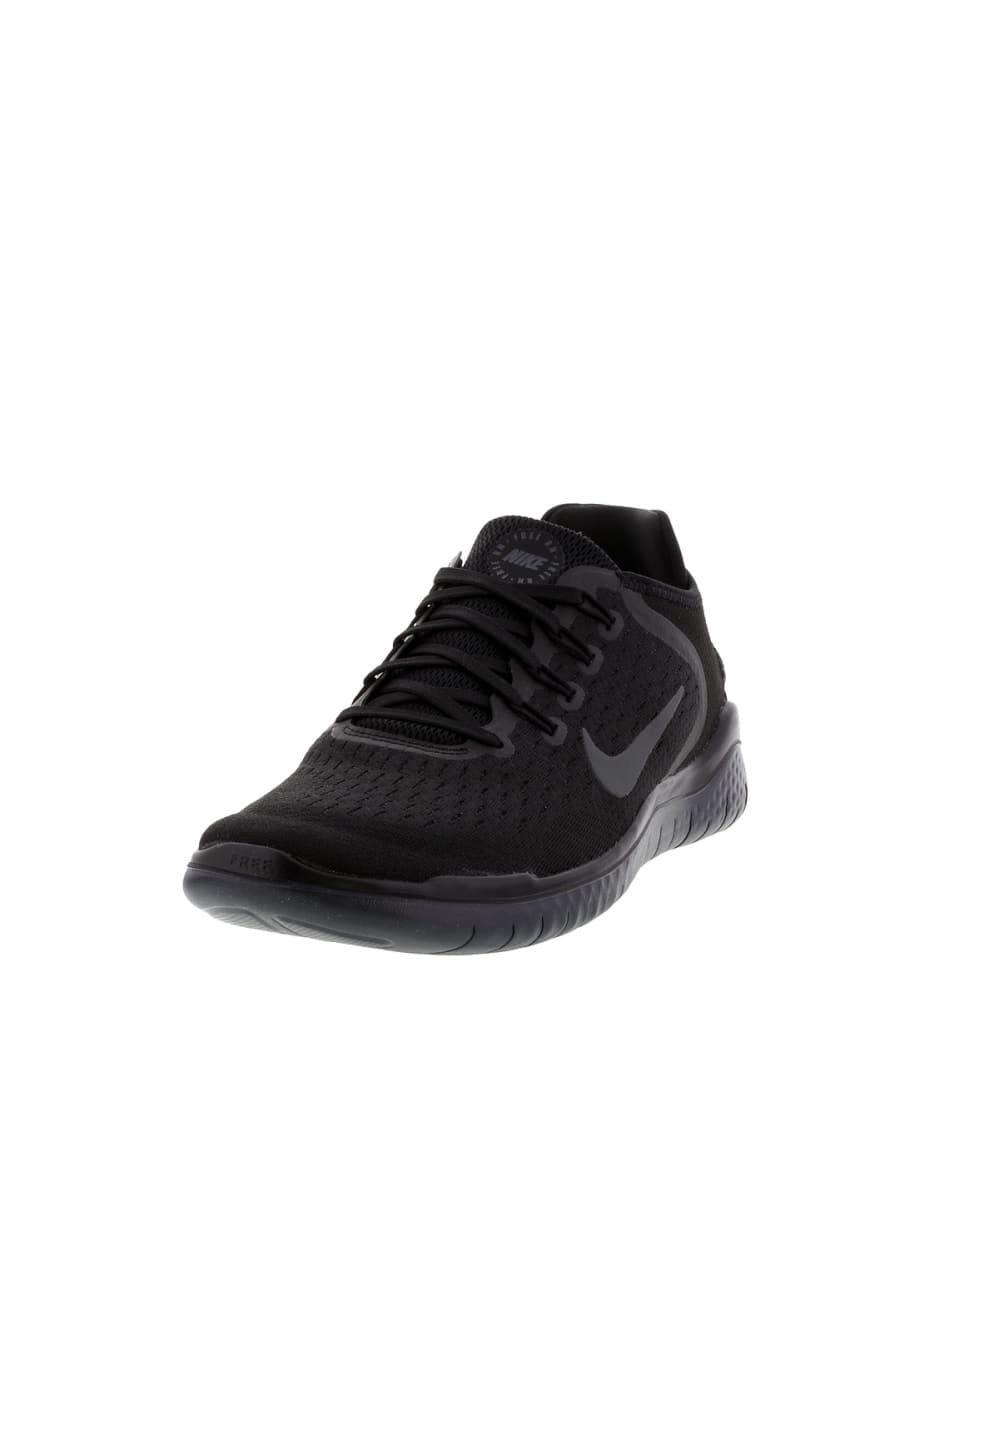 b98191aa589 Nike Free RN 2018 - Zapatillas de running para Hombre - Negro